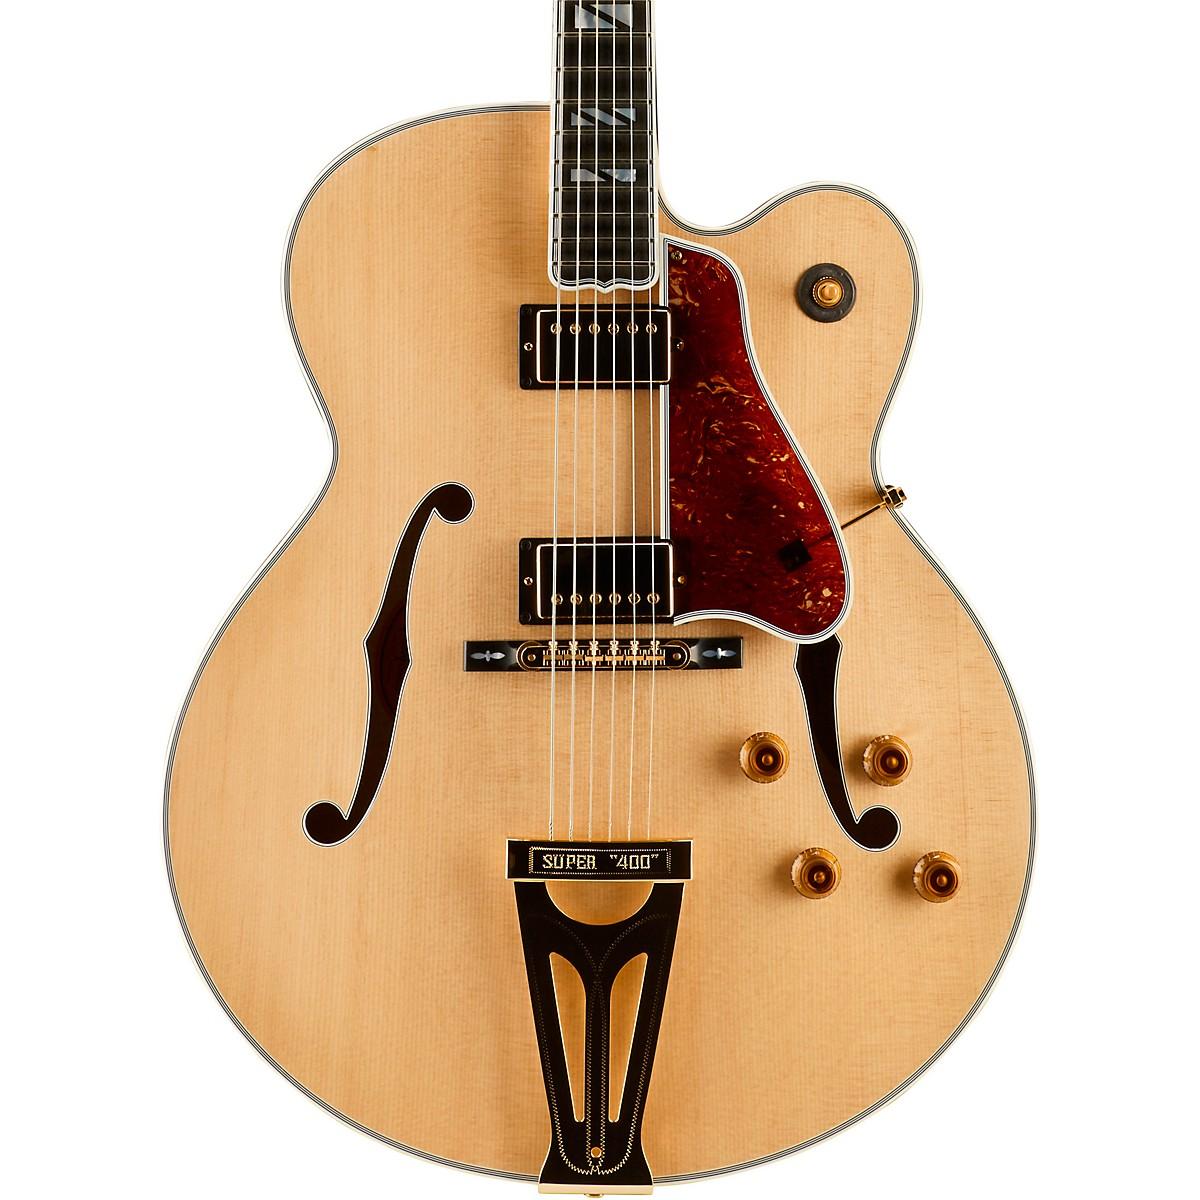 Gibson Custom Super 400 Thinline Hollowbody Electric Guitar